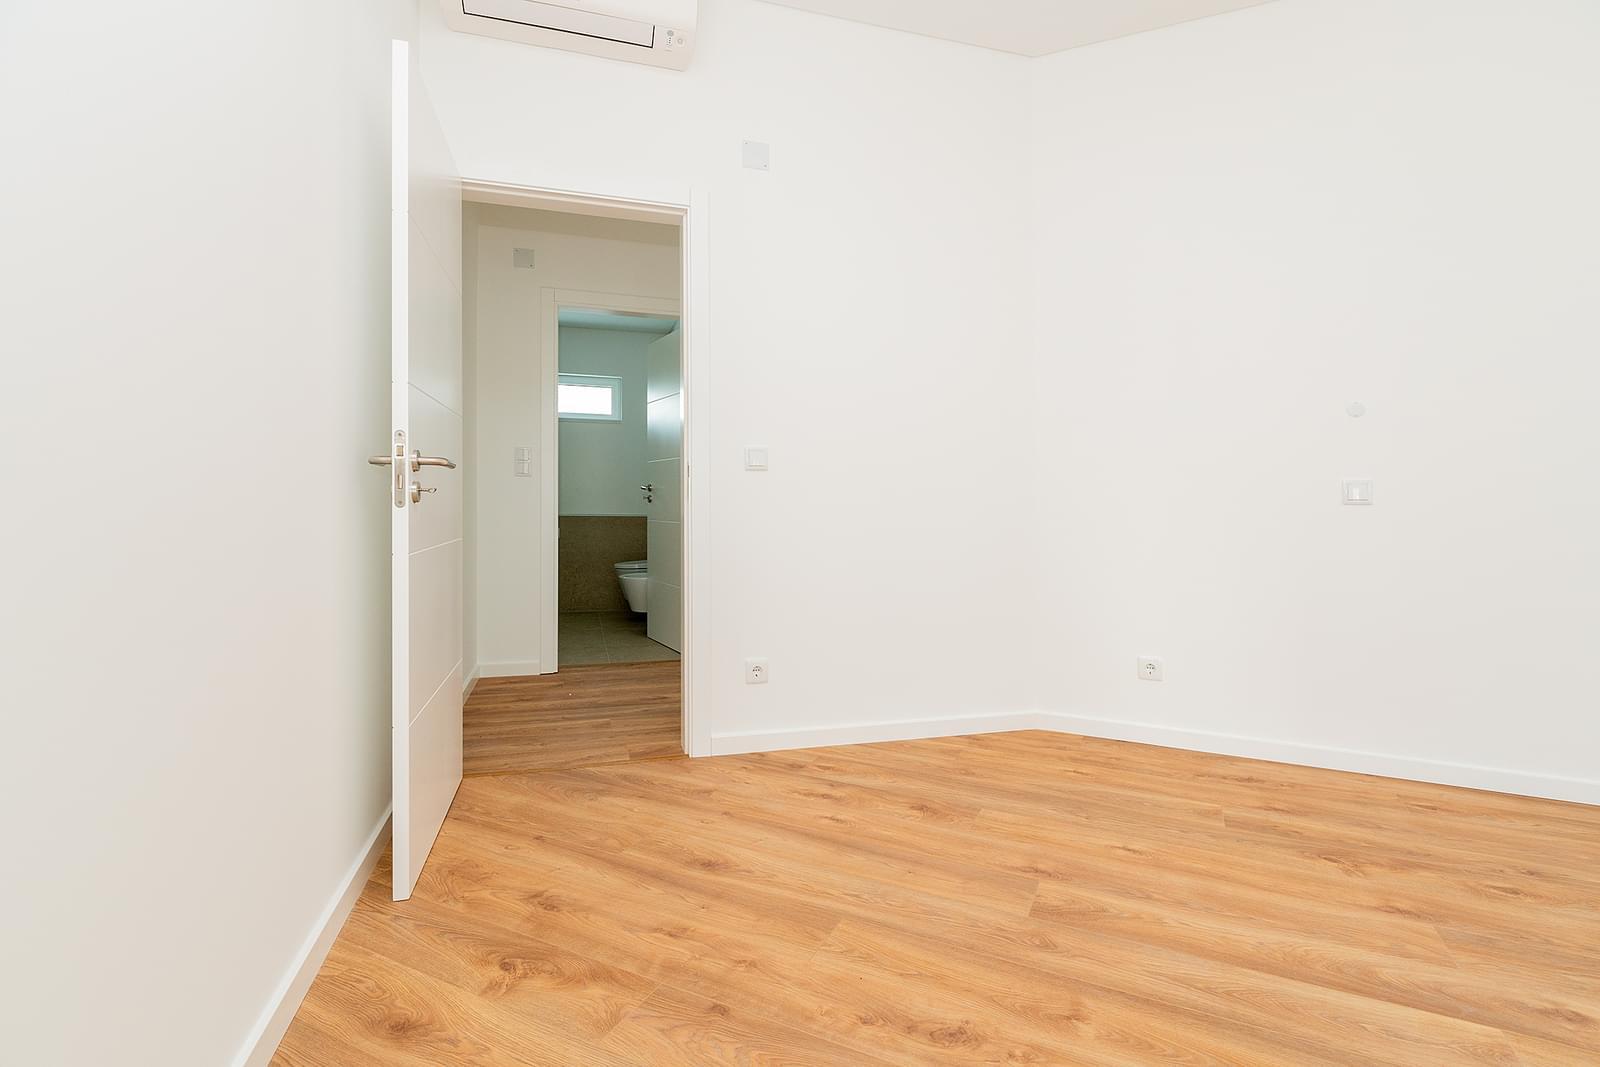 pf18413-apartamento-t1-lisboa-7c9b1785-1e03-4036-805a-c6b646b0df3c